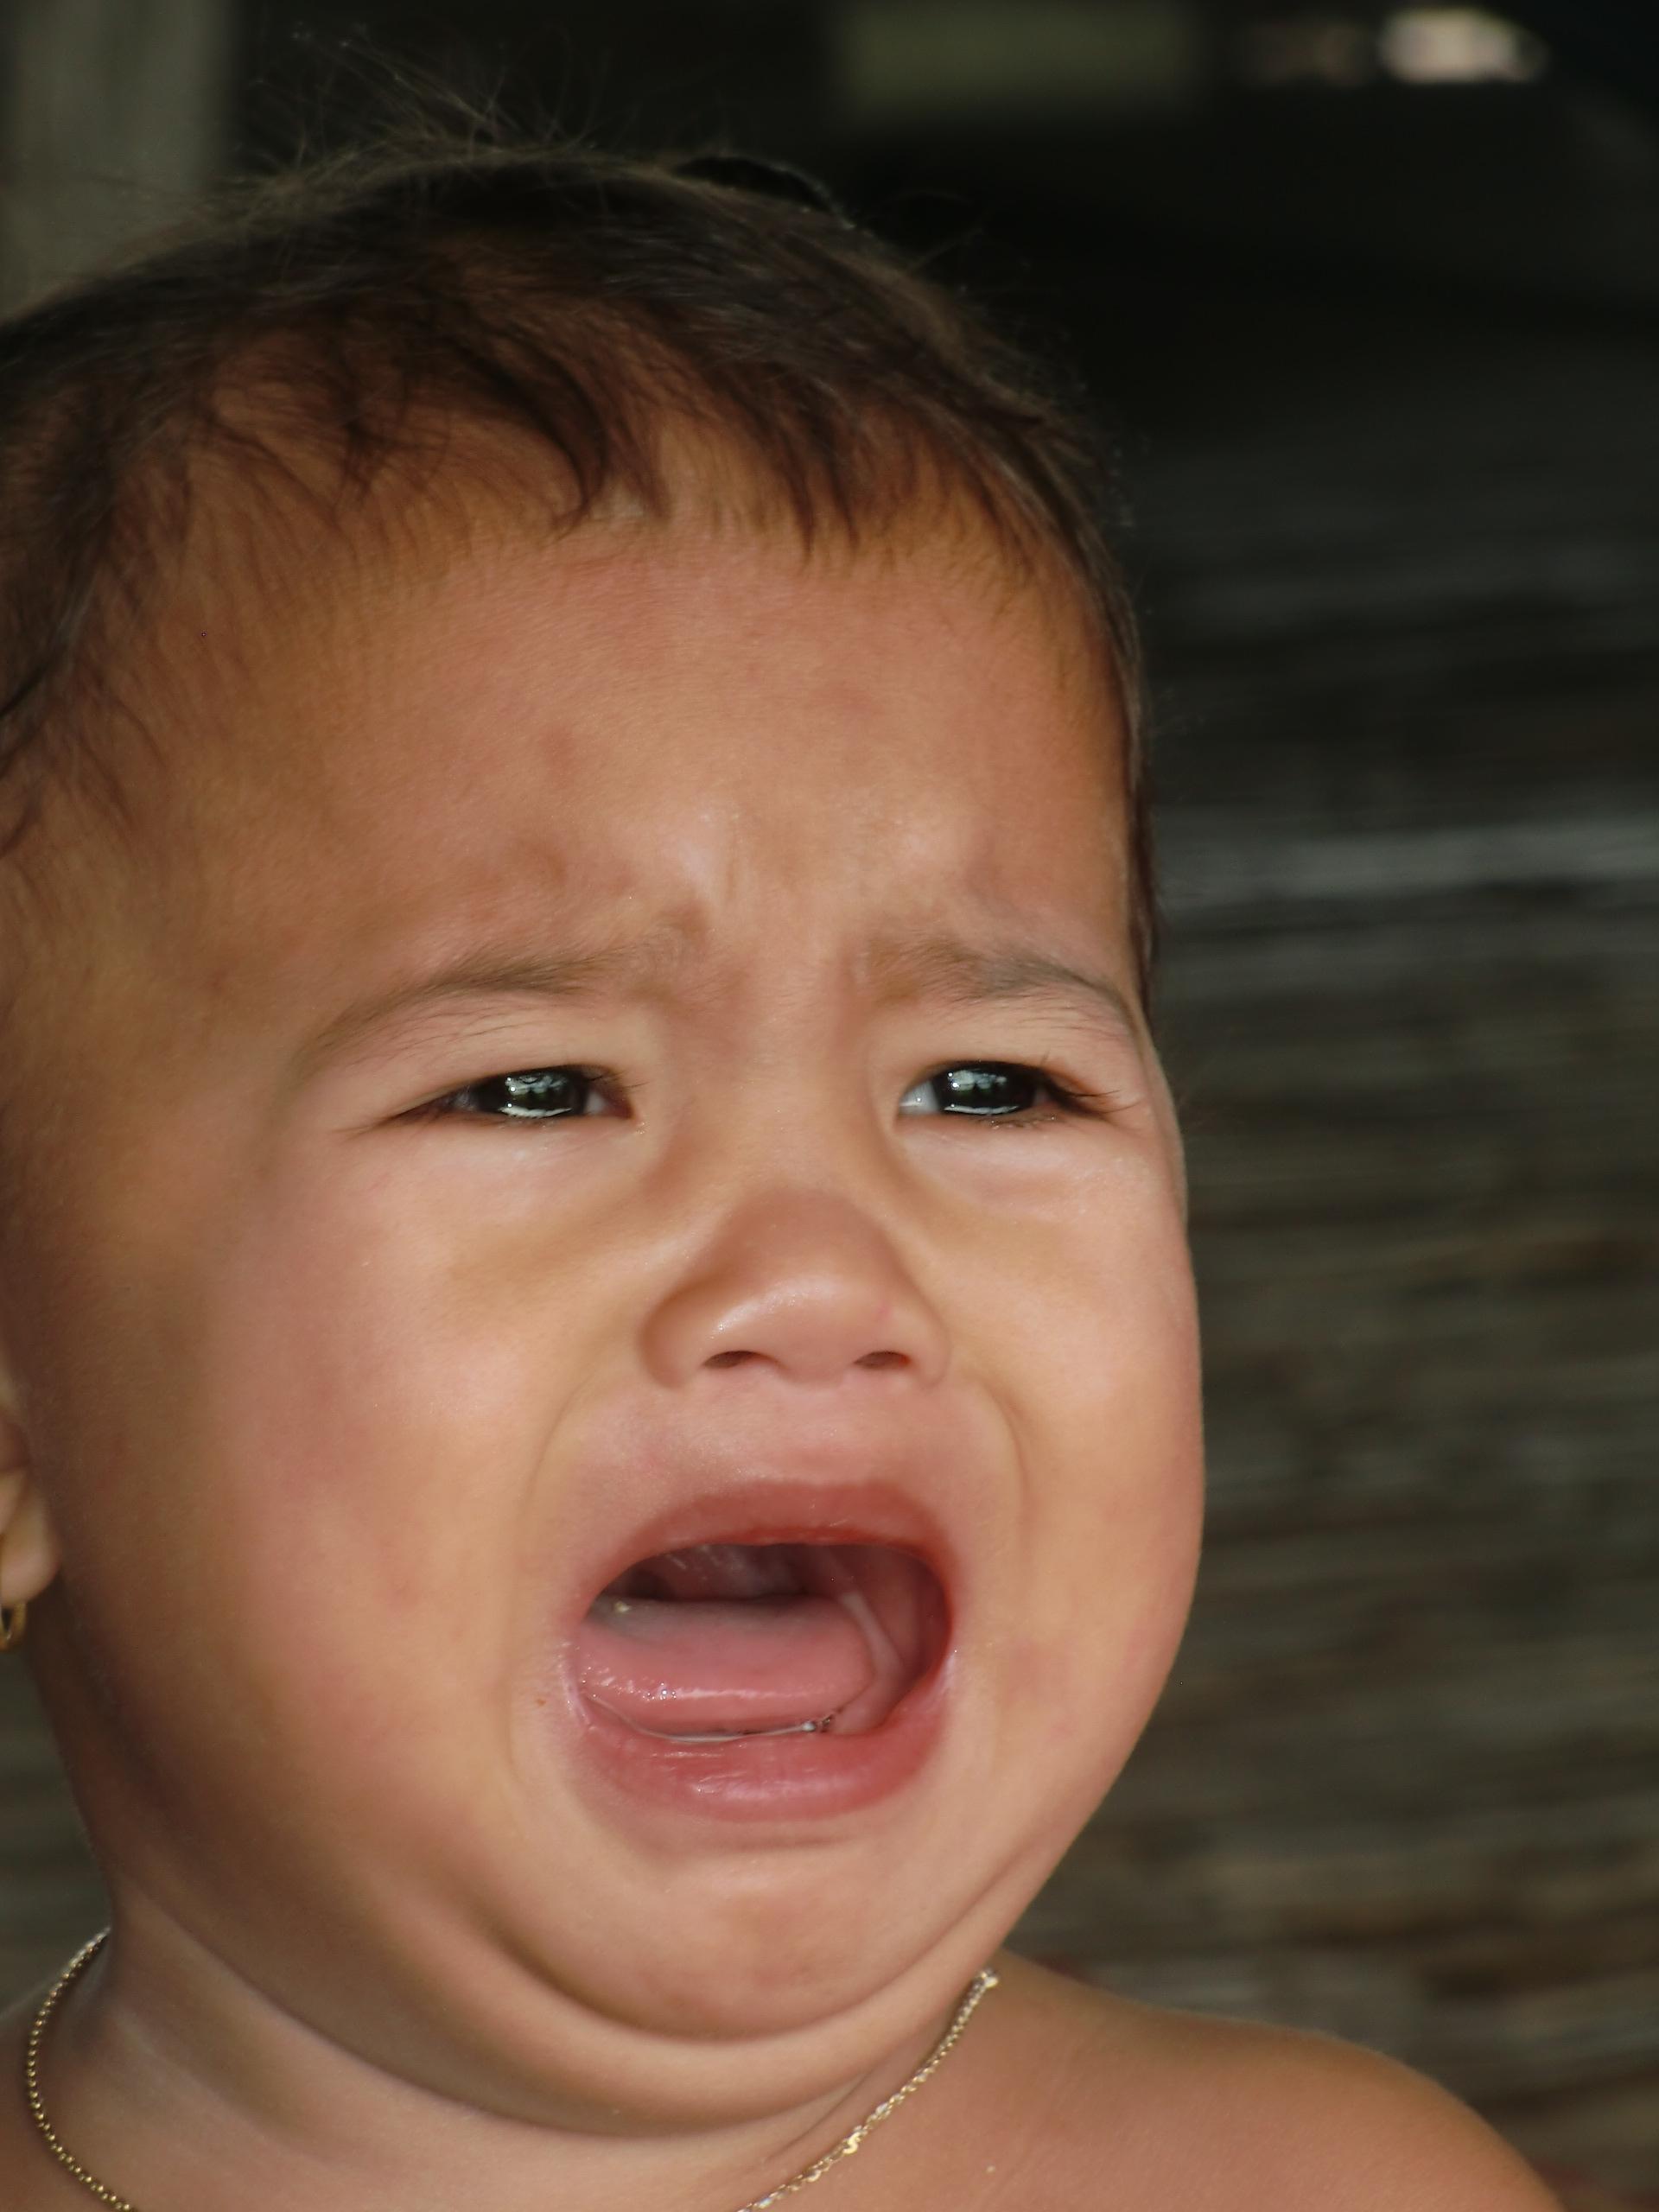 Crying-Baby3.jpg